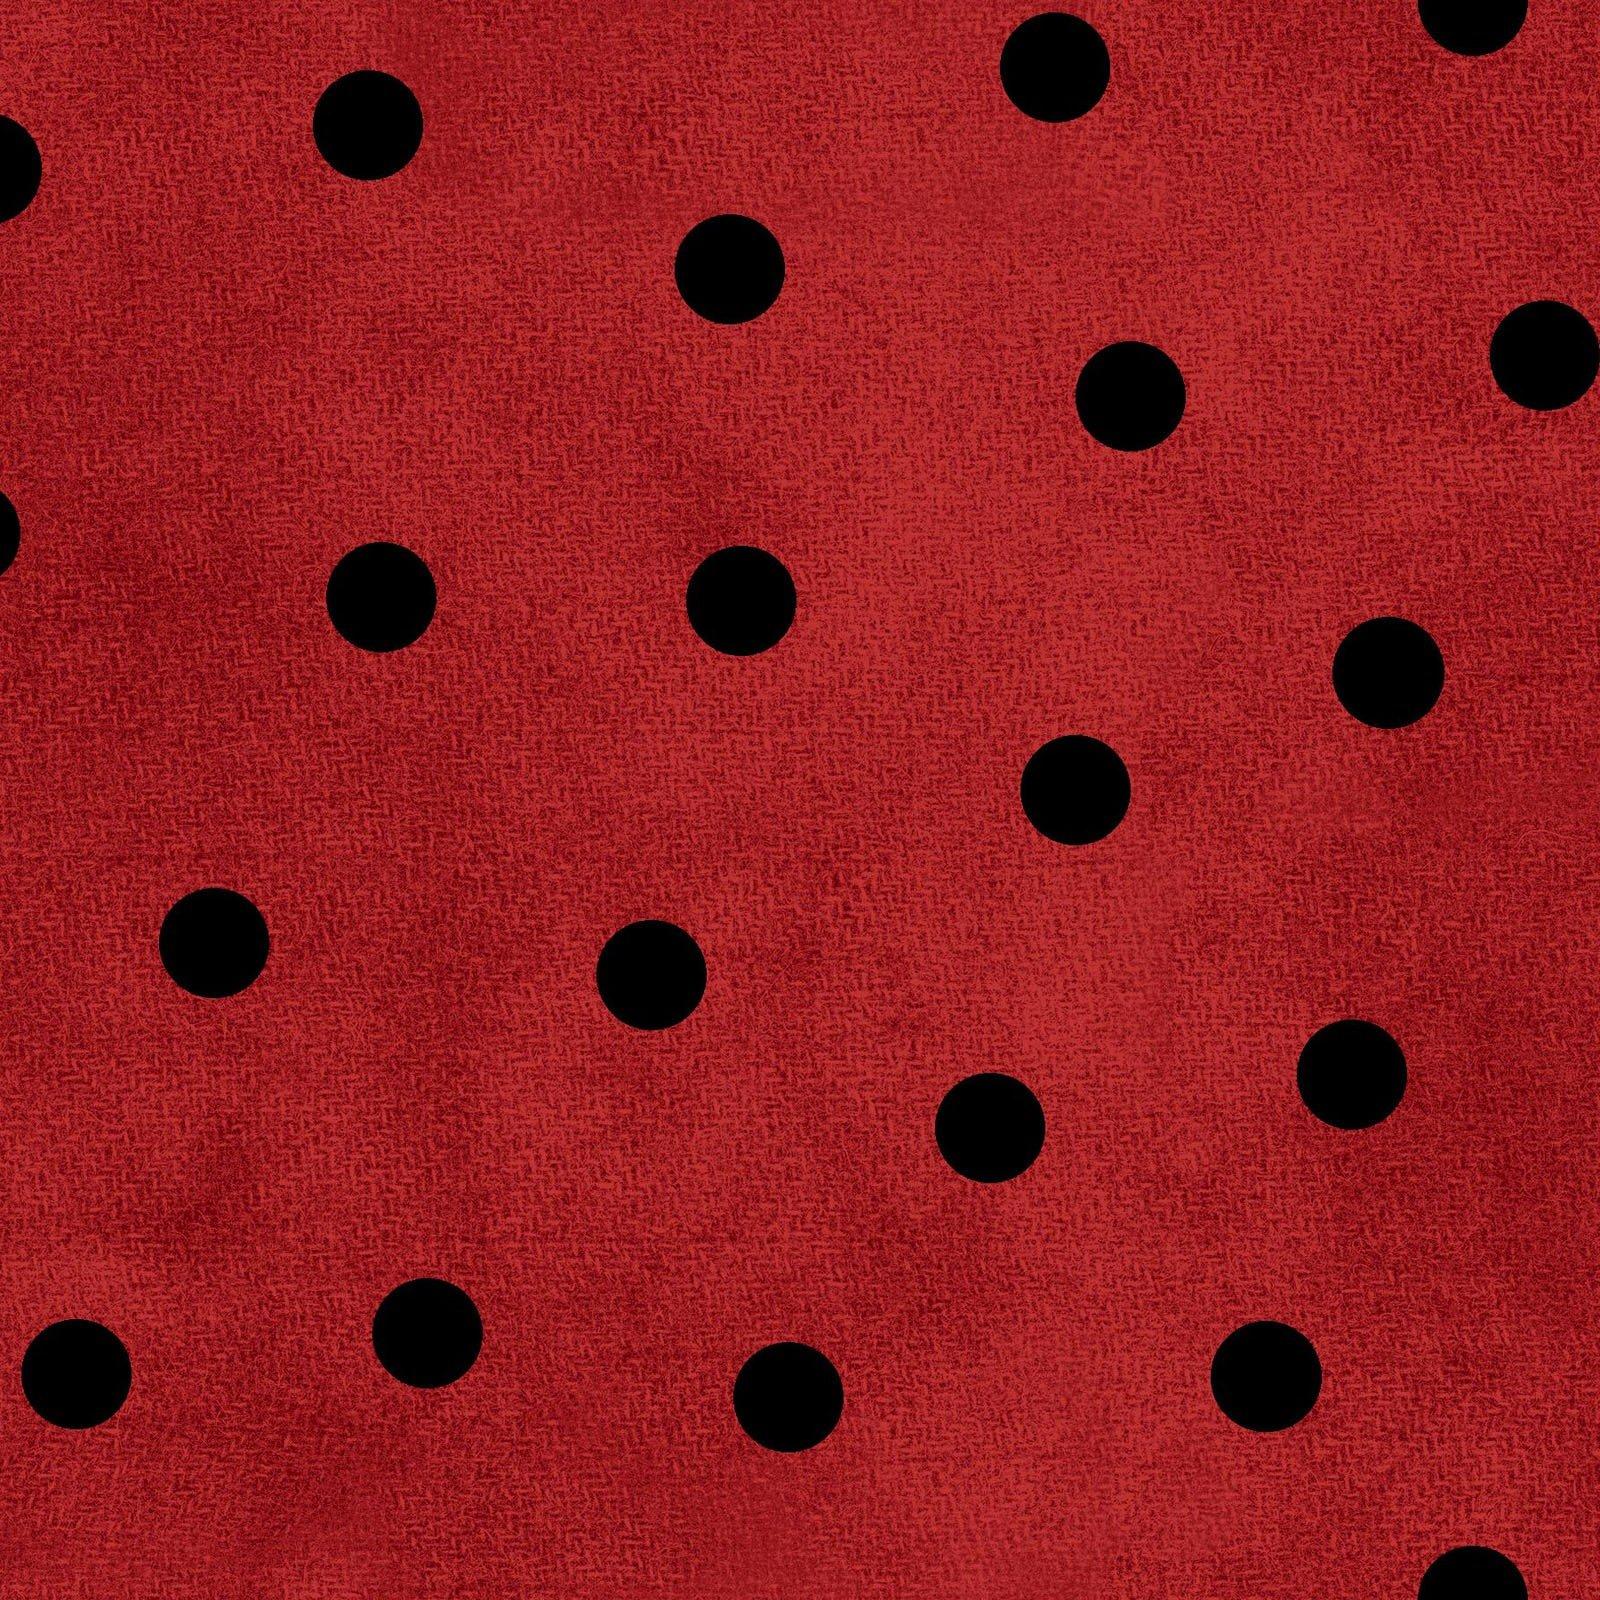 Red/Black - Big Dots - Most Wonderful Time Flannel - MASF9214-RJ